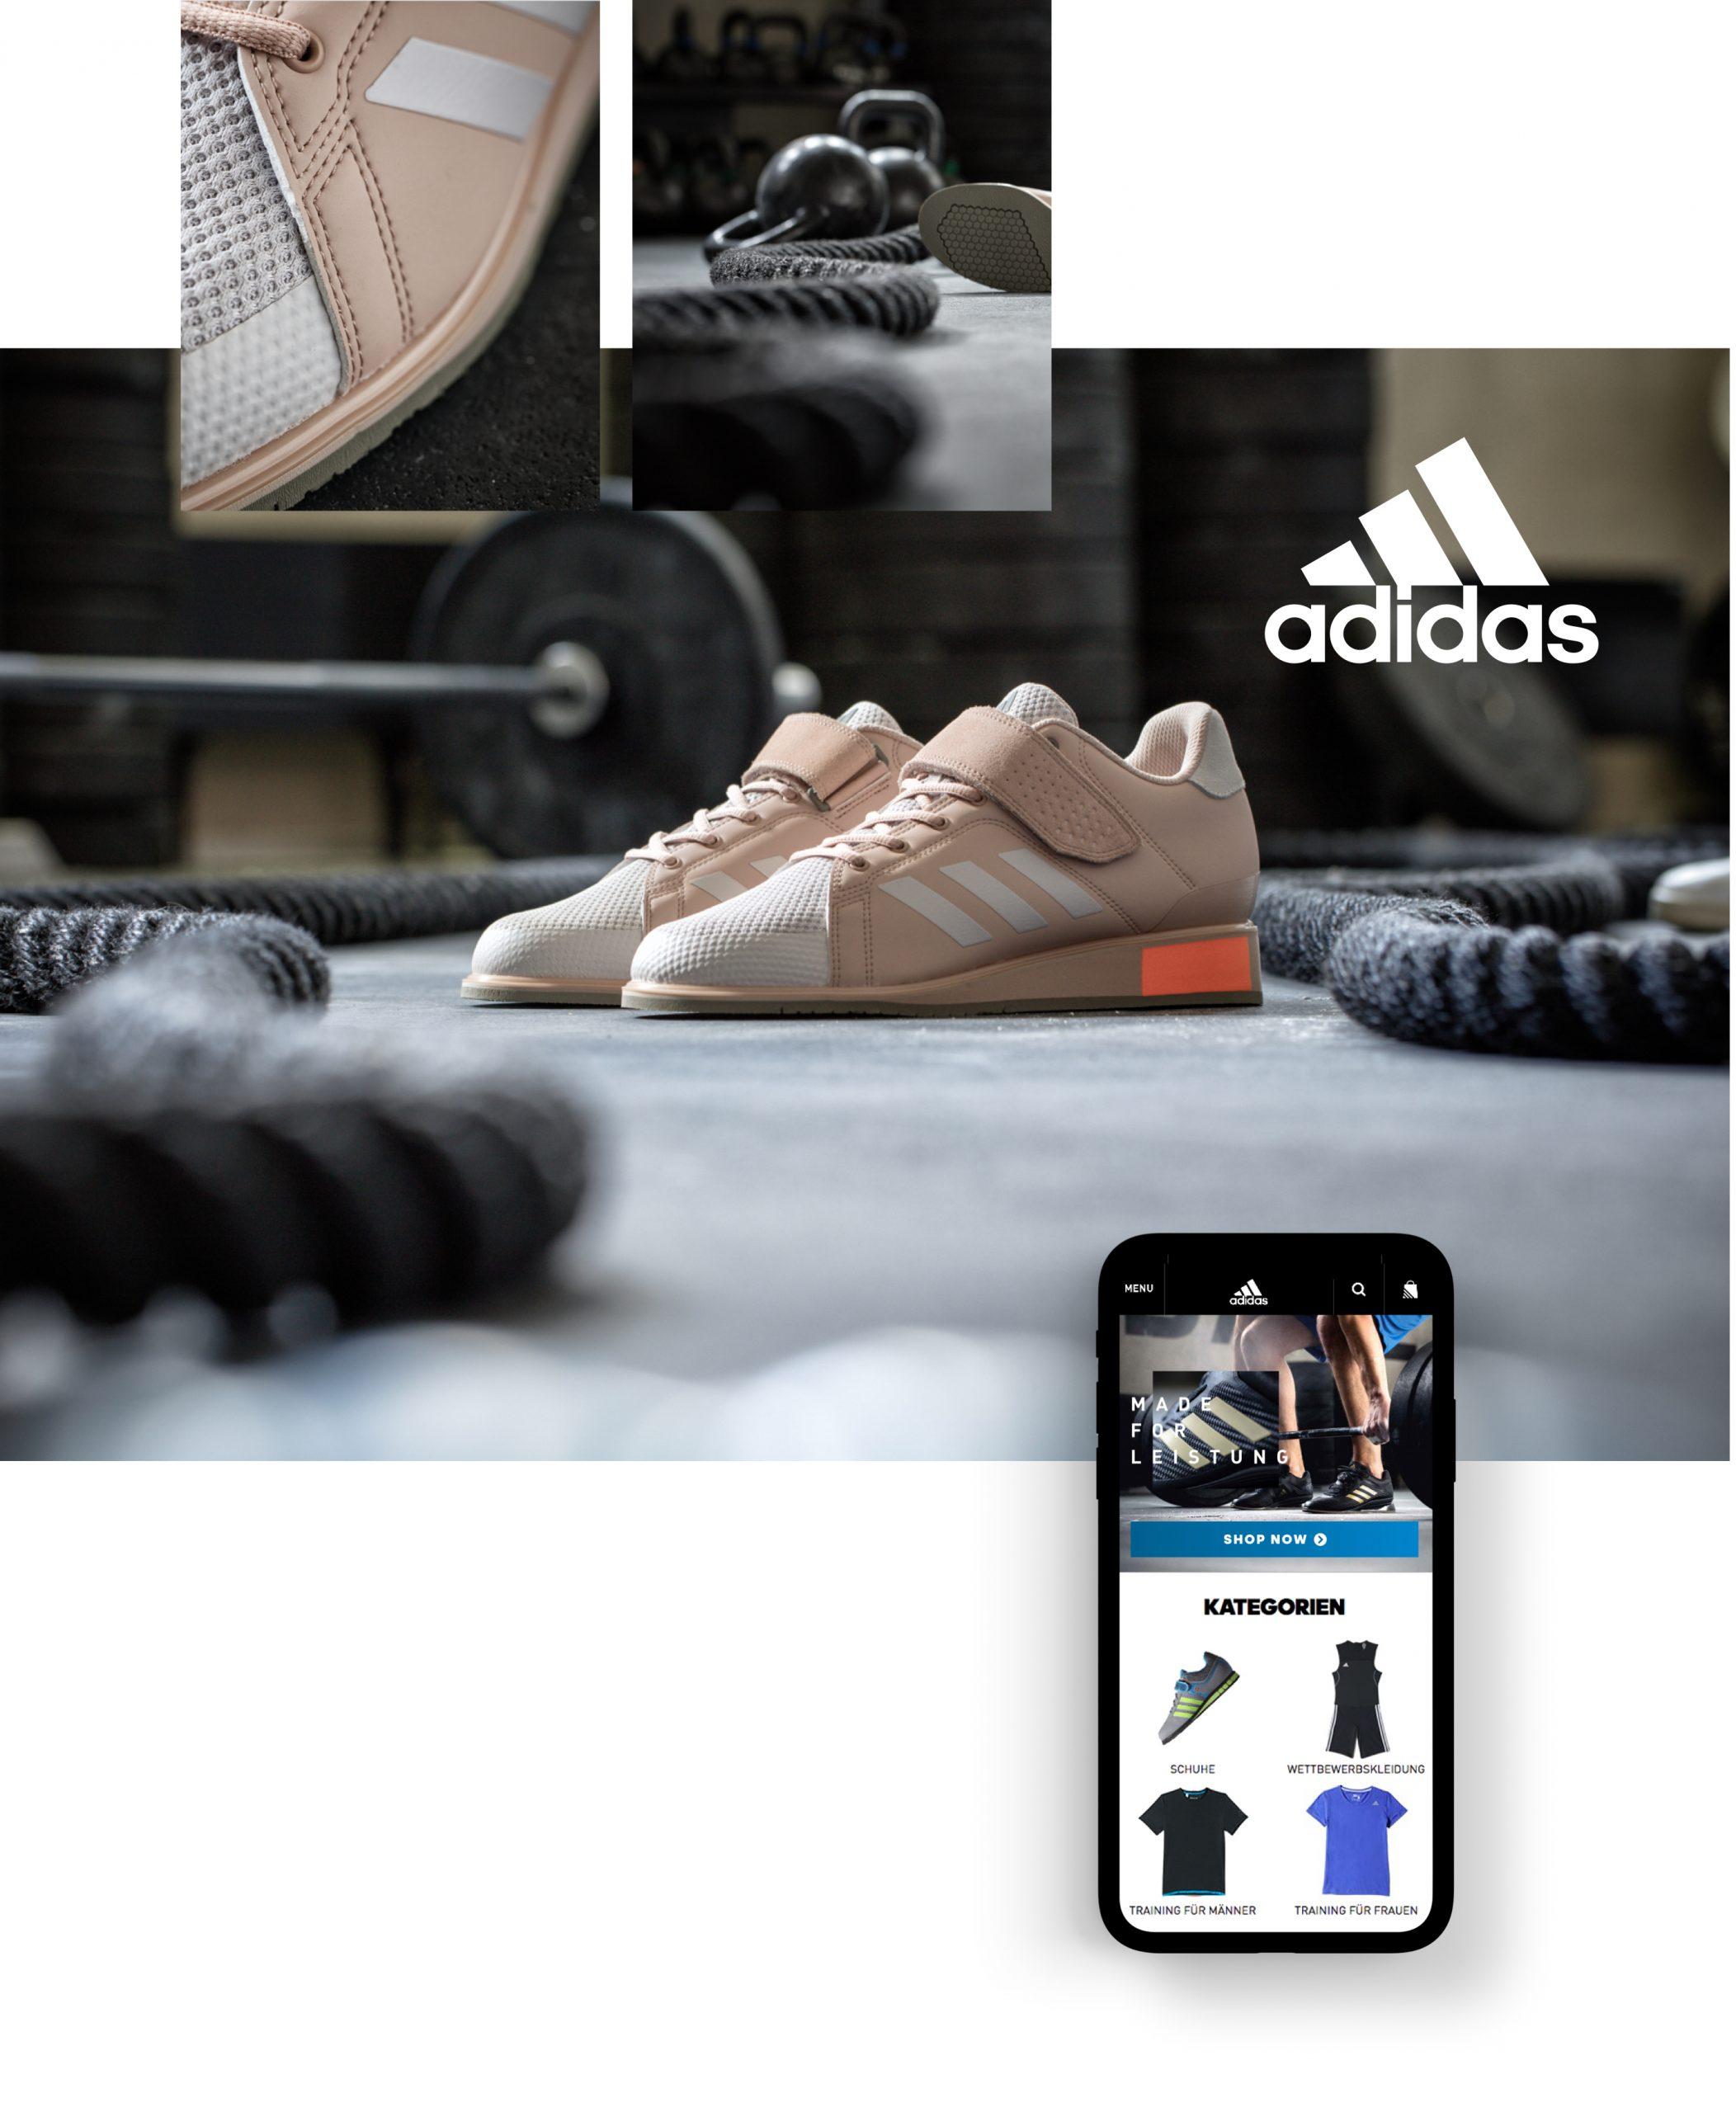 pascher-heinz-adidas-weightlifting-product